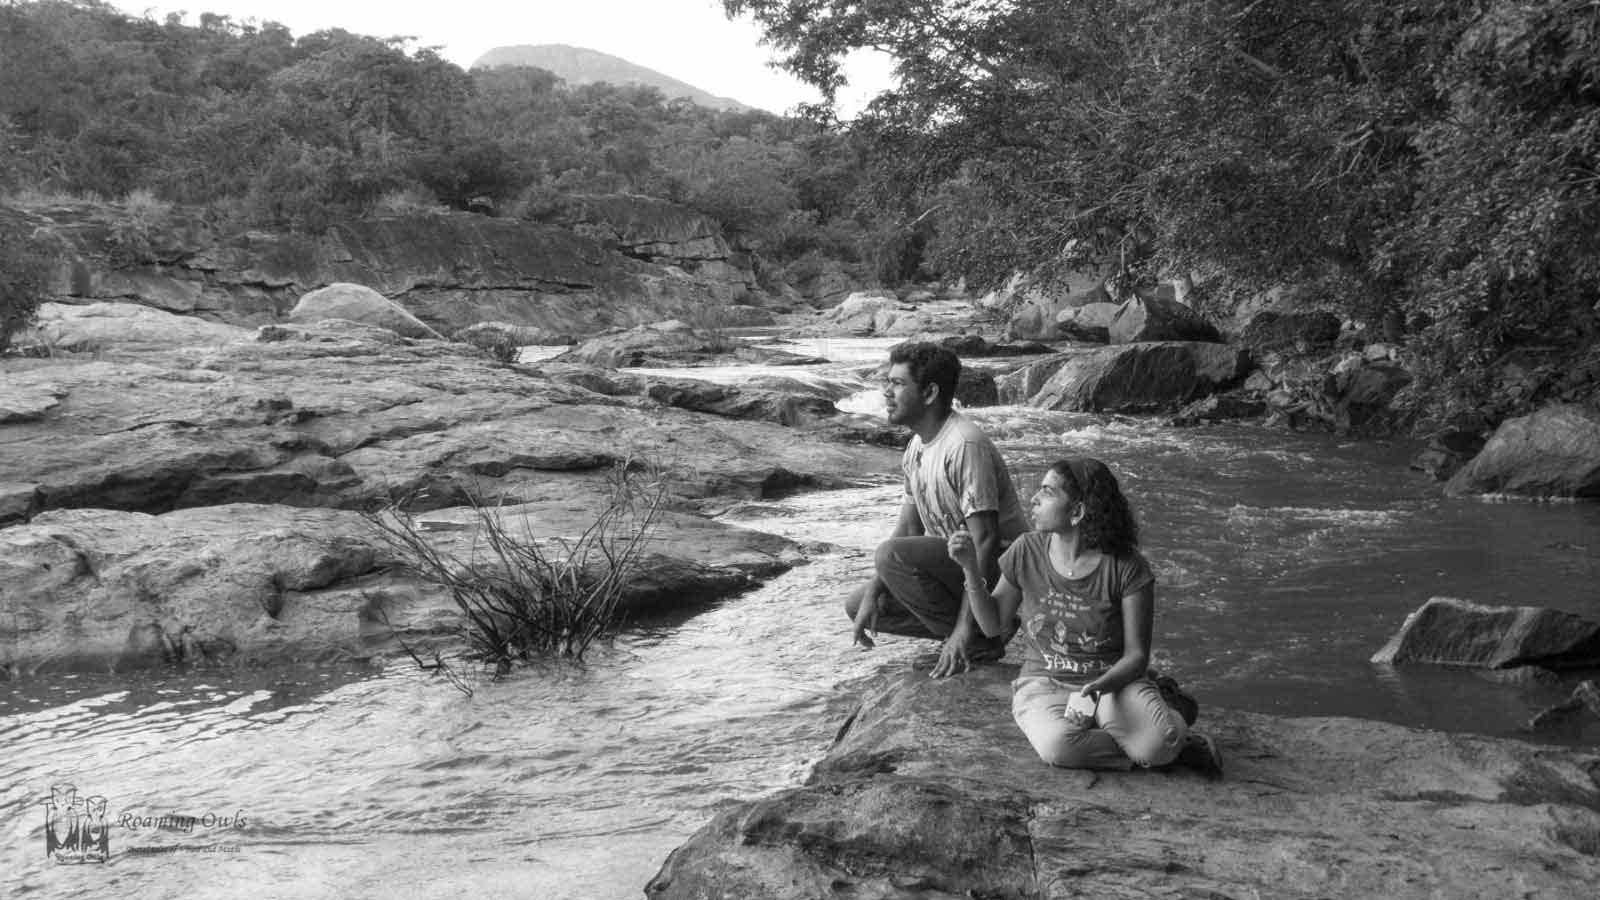 vinod sadhasivan,paulmathi vinod,chinnar wildlife sanctuary